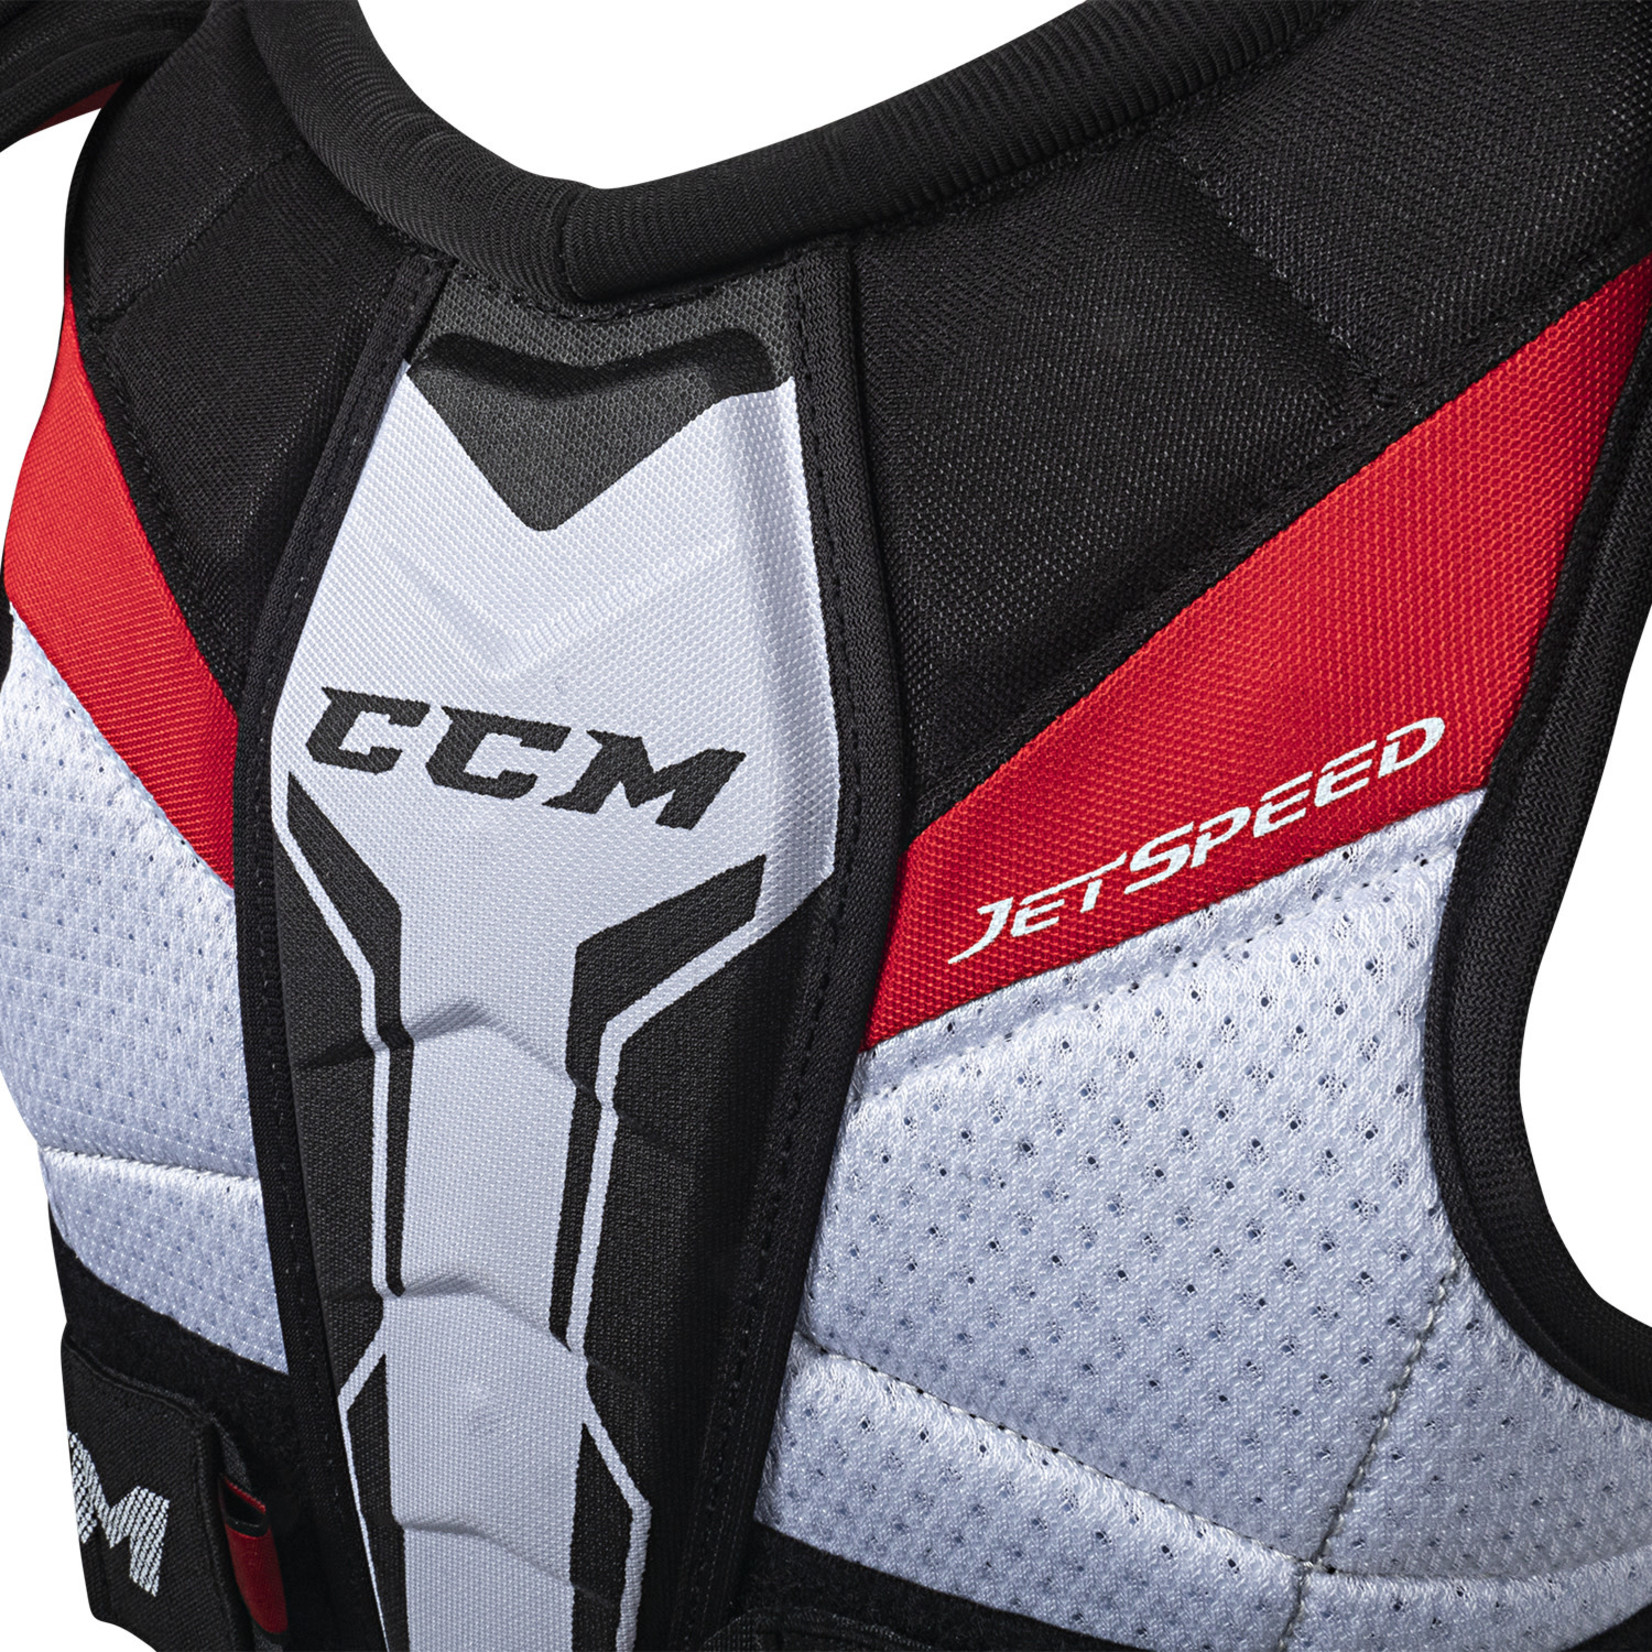 CCM CCM Hockey Shoulder Pads, Jetspeed Xtra, Senior